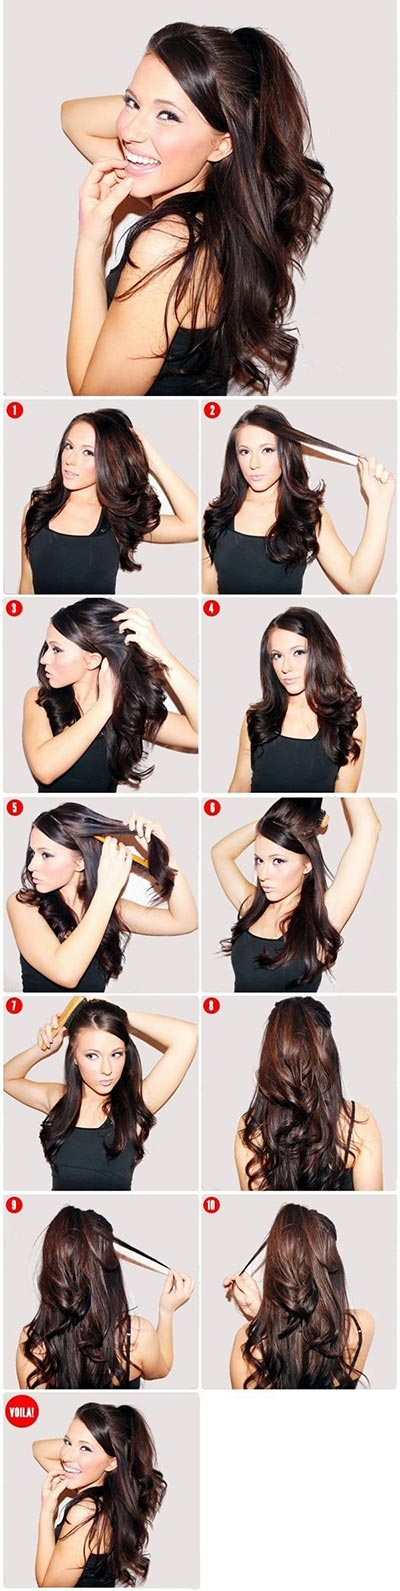 half-up-half-down-hairstyles-20